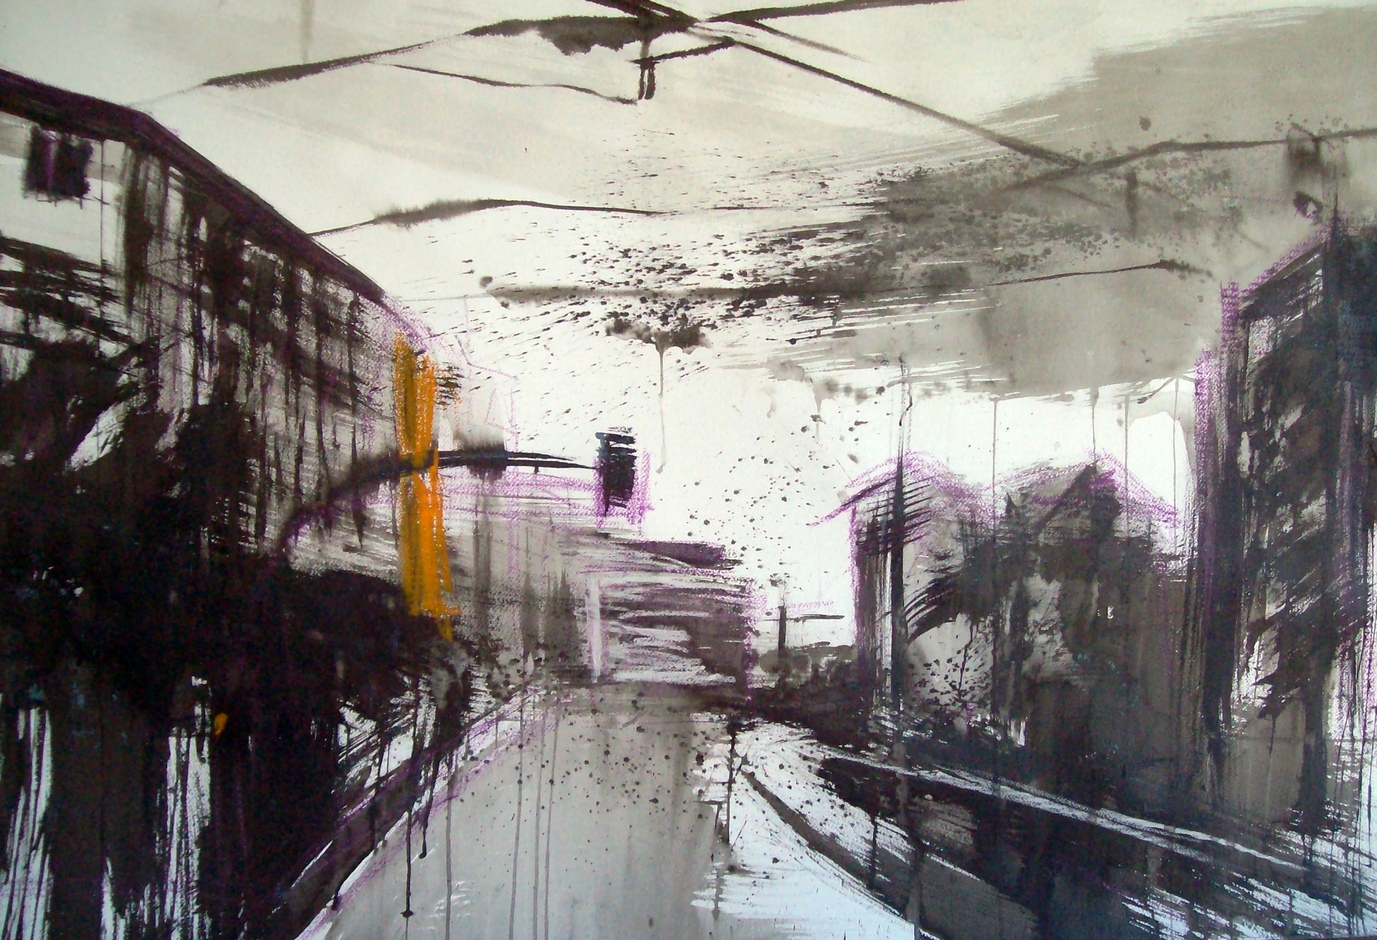 2012 Via Andrea Costa, 90x140cm, tecnica mista su carta